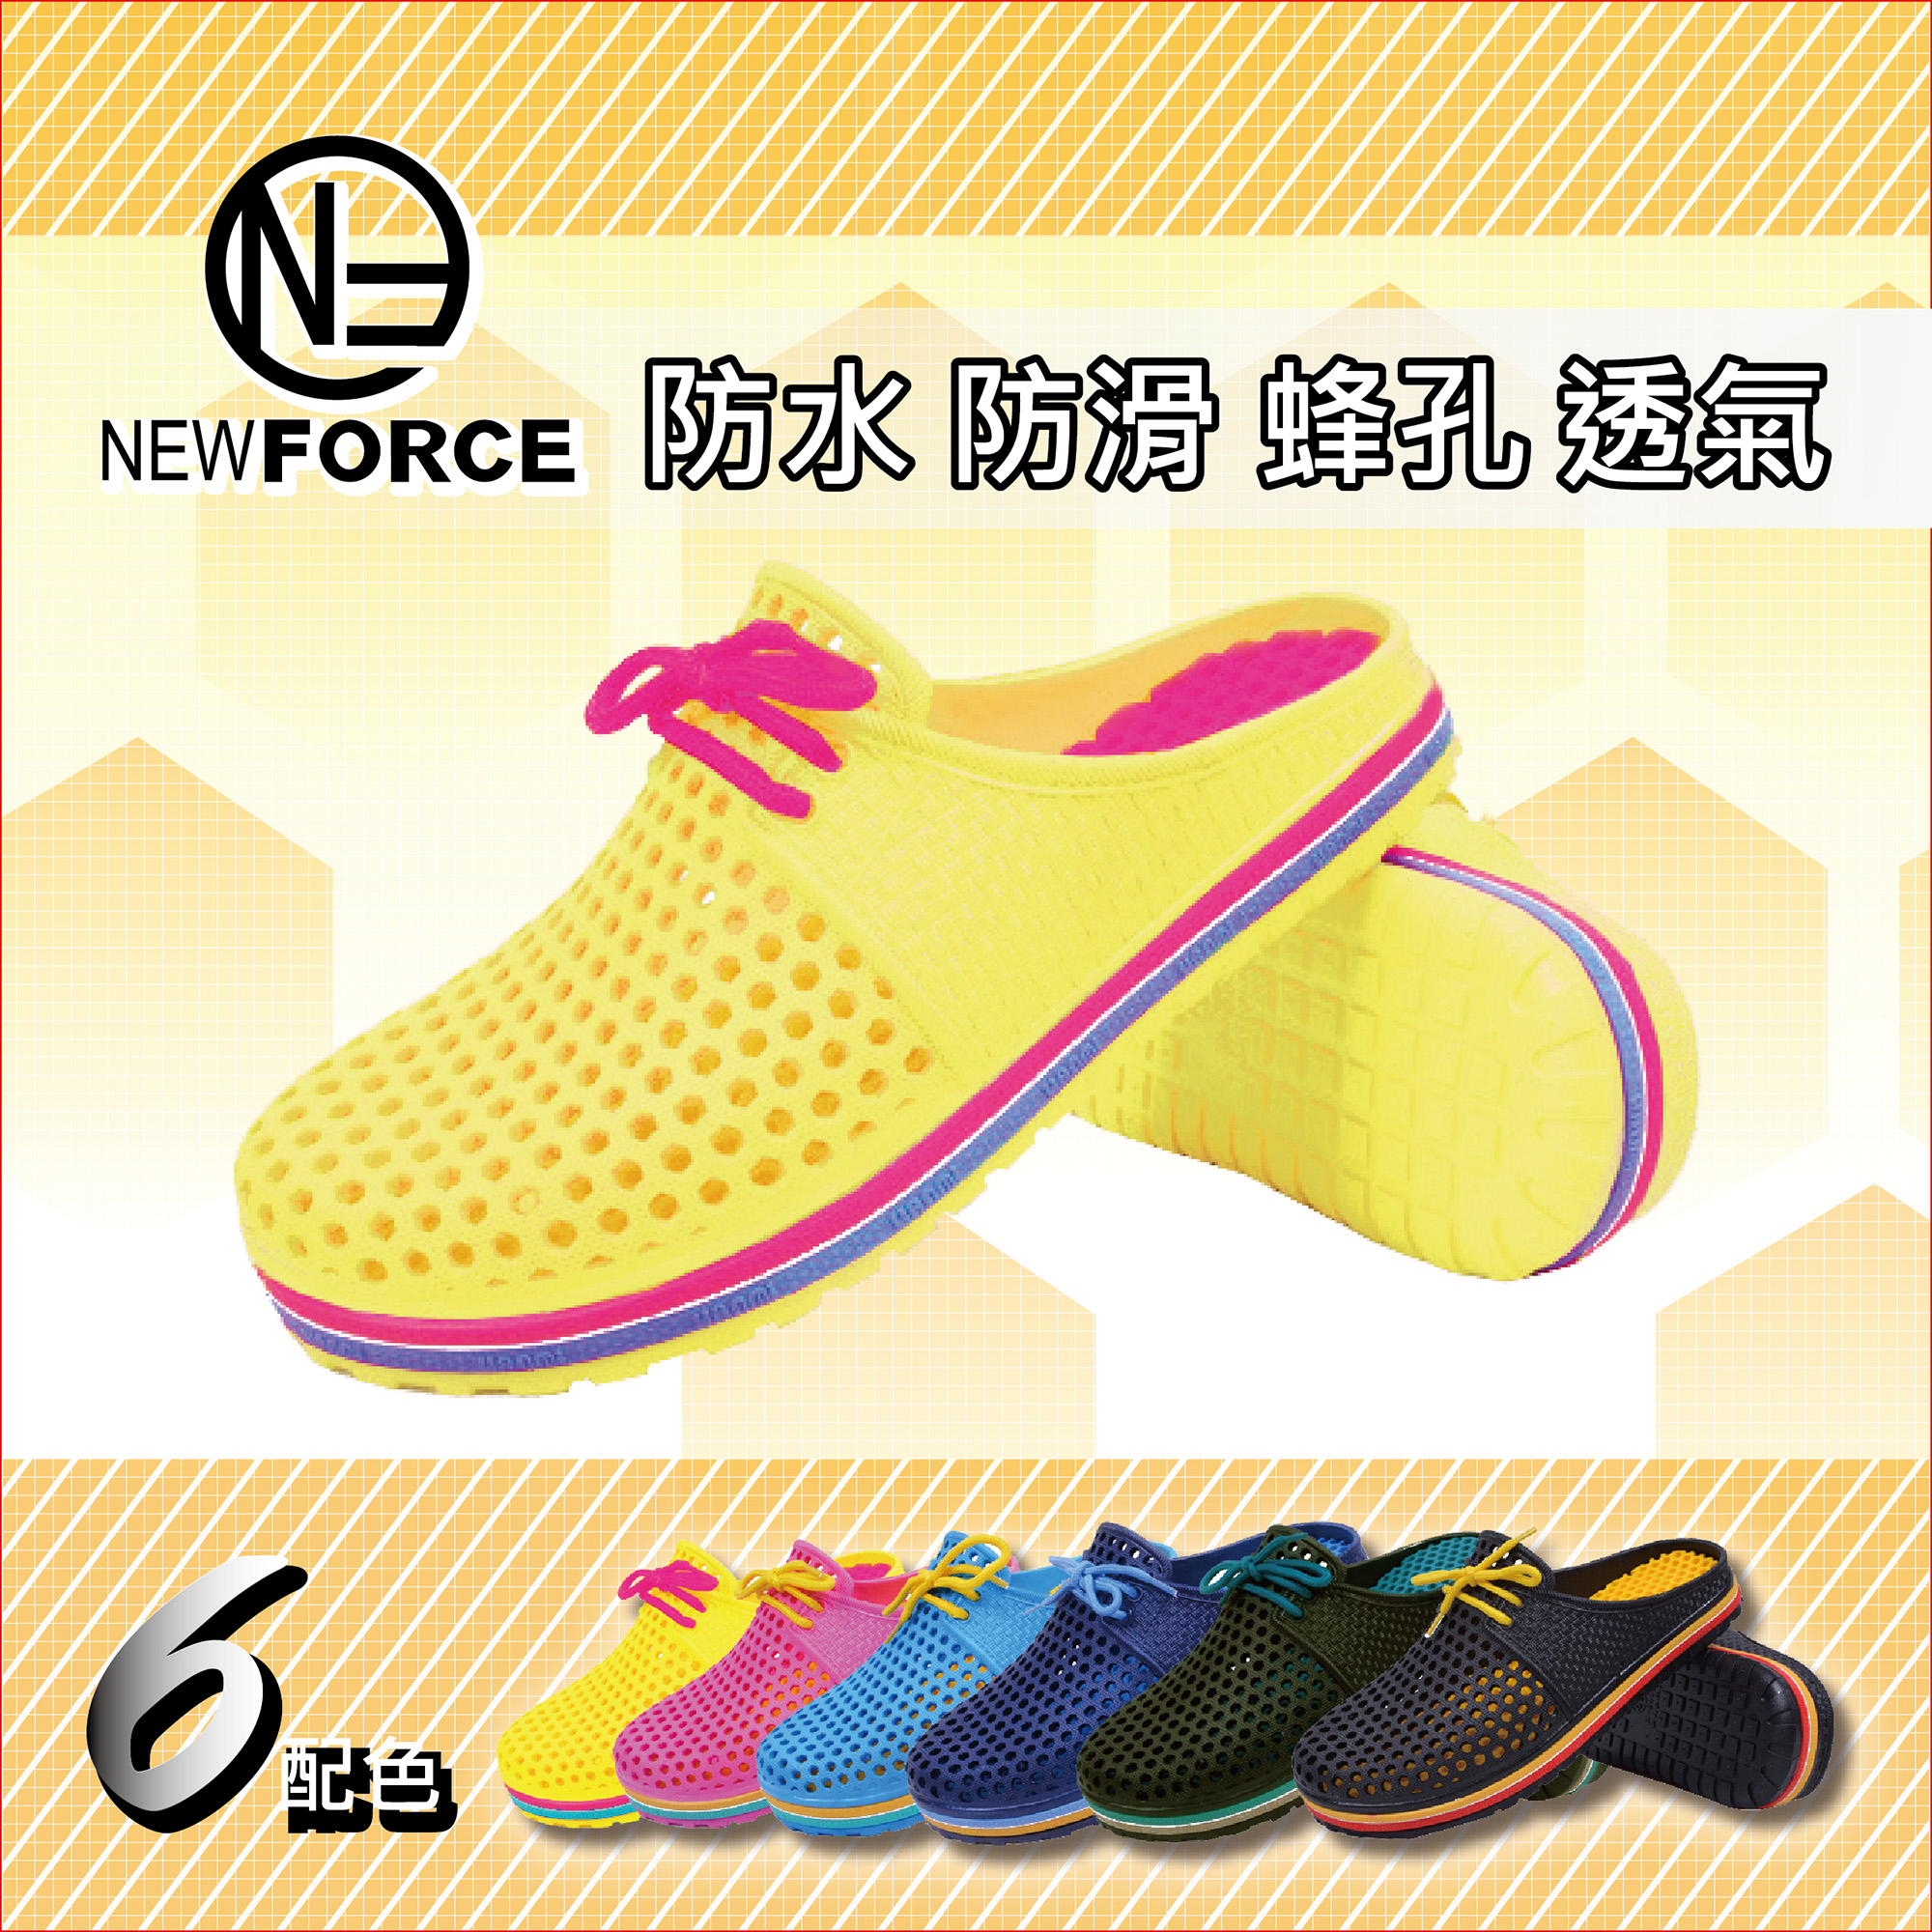 【NEW FORCE】超動感軟Q情侶洞洞鞋 - 女款/3色可選 【6010106】